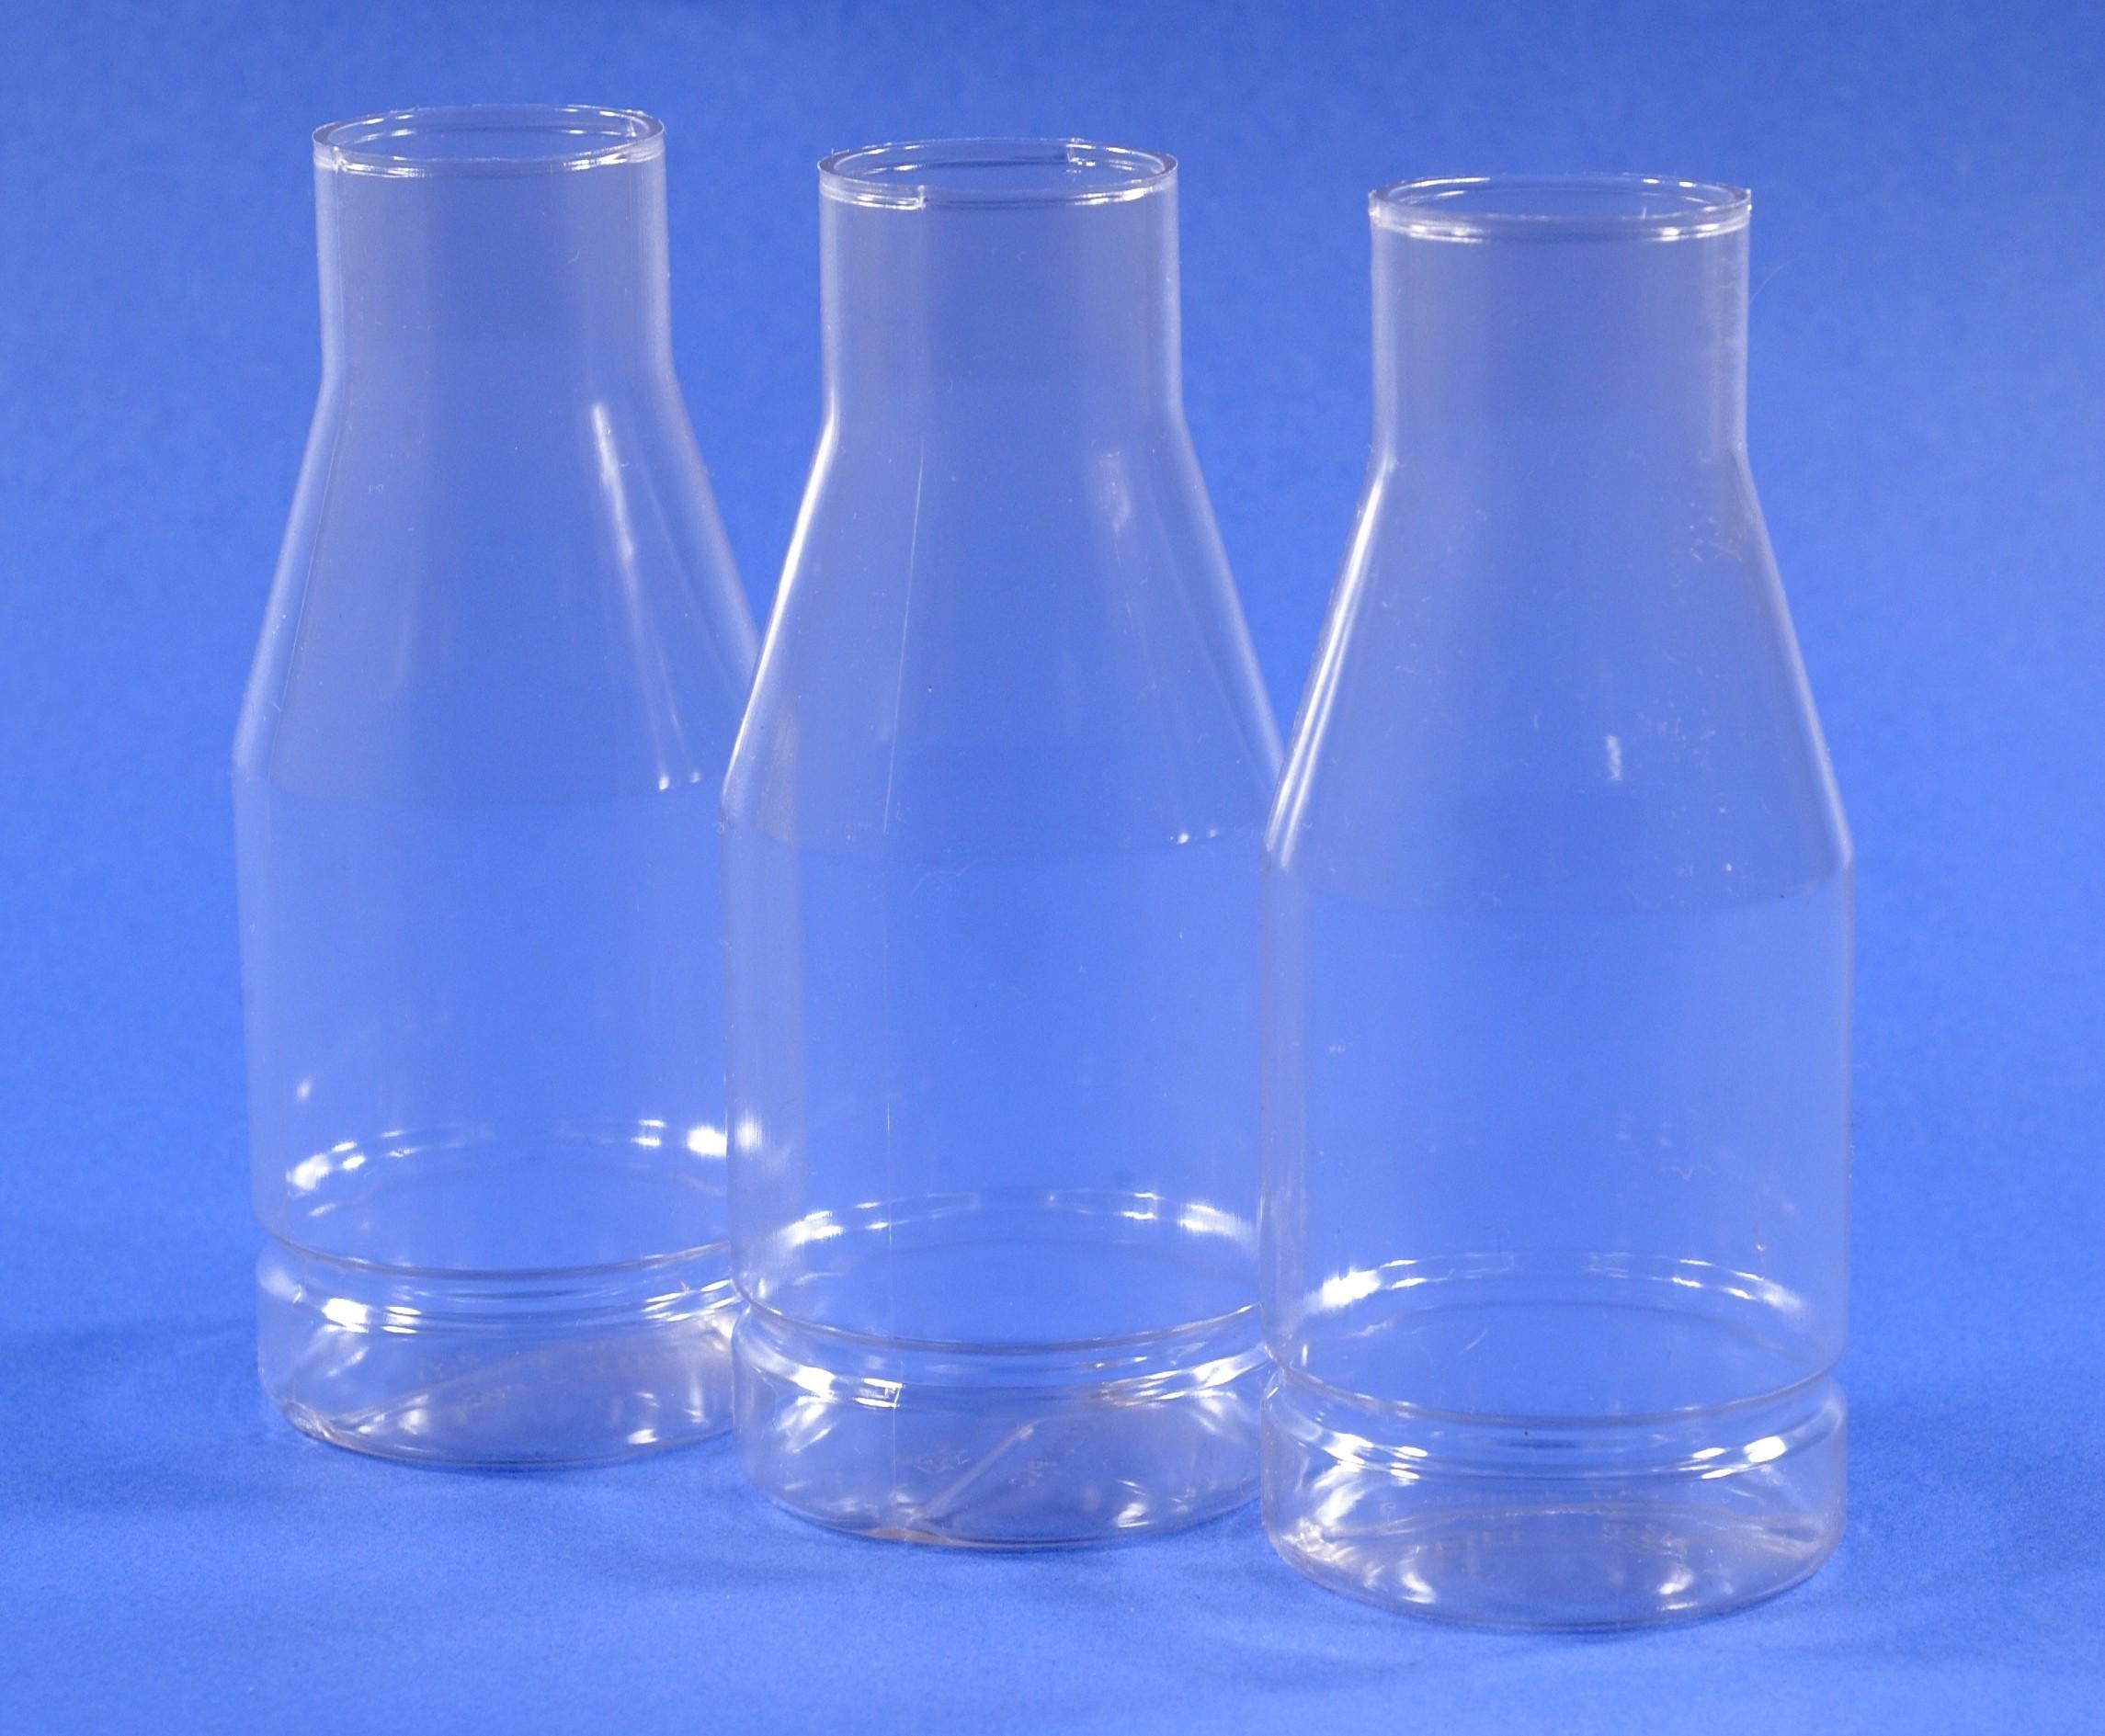 Image of three drosophila bottles